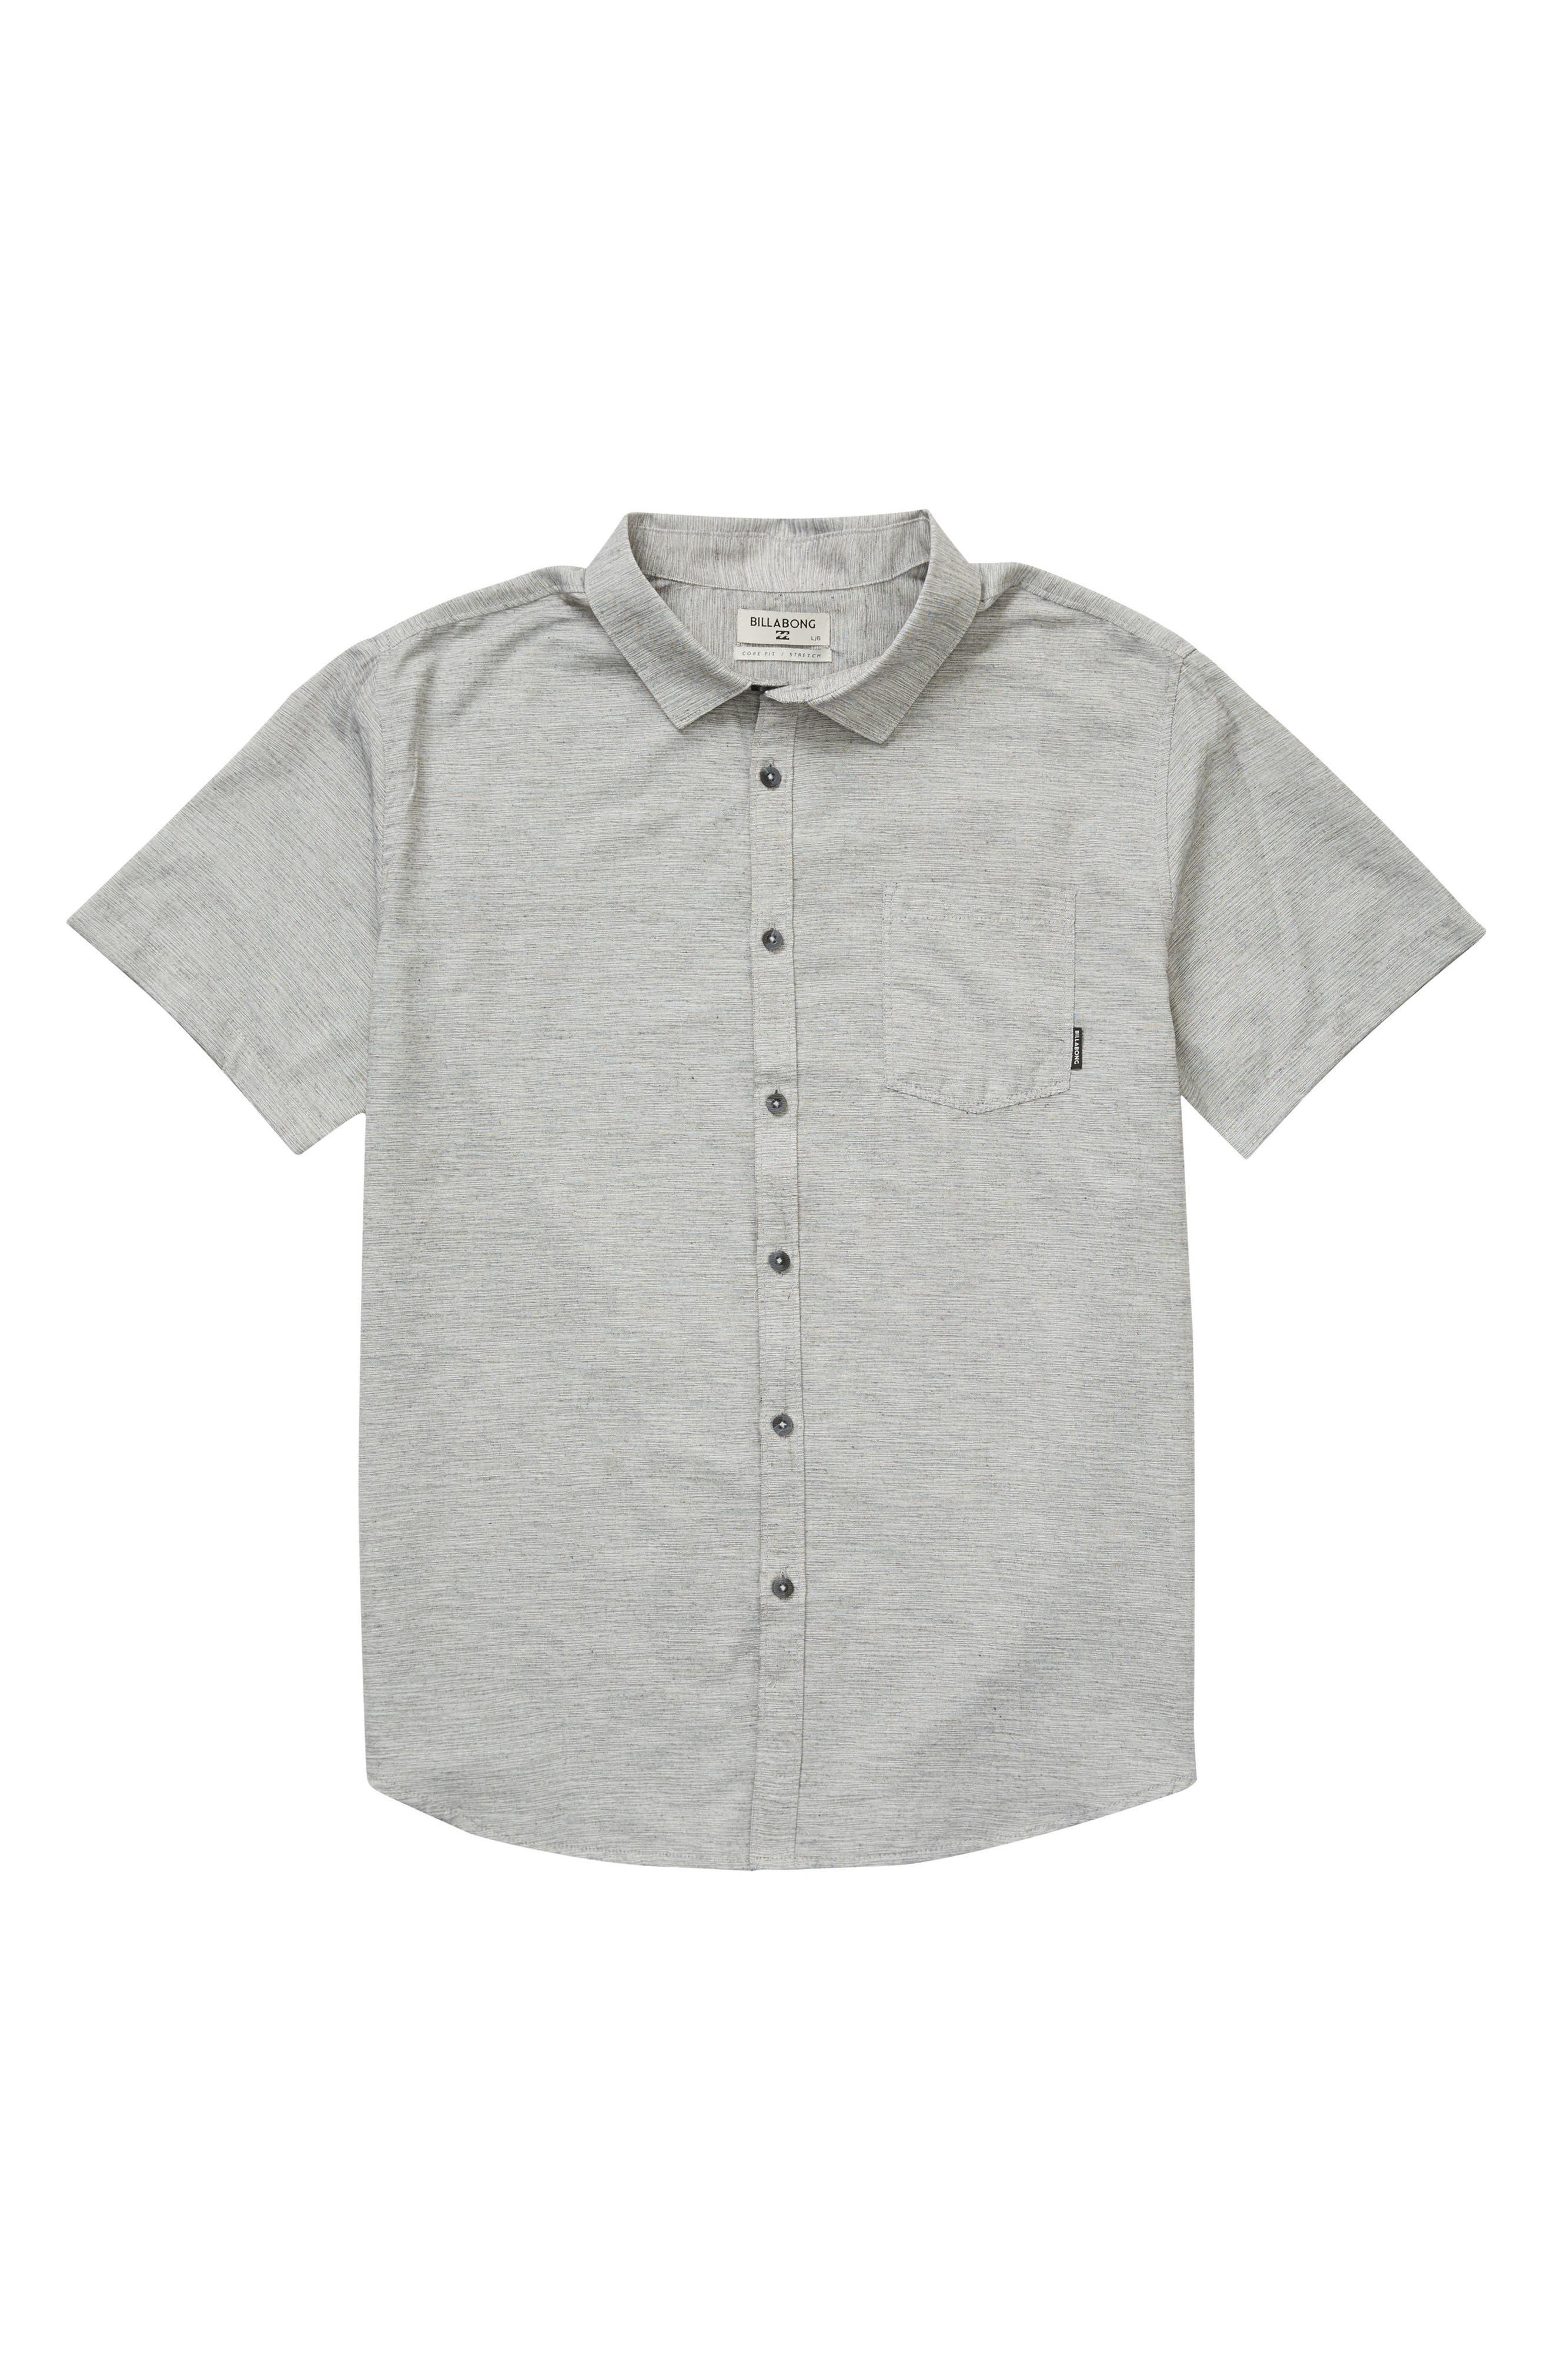 Alternate Image 1 Selected - Billabong All Day Helix Woven Shirt (Toddler Boys)